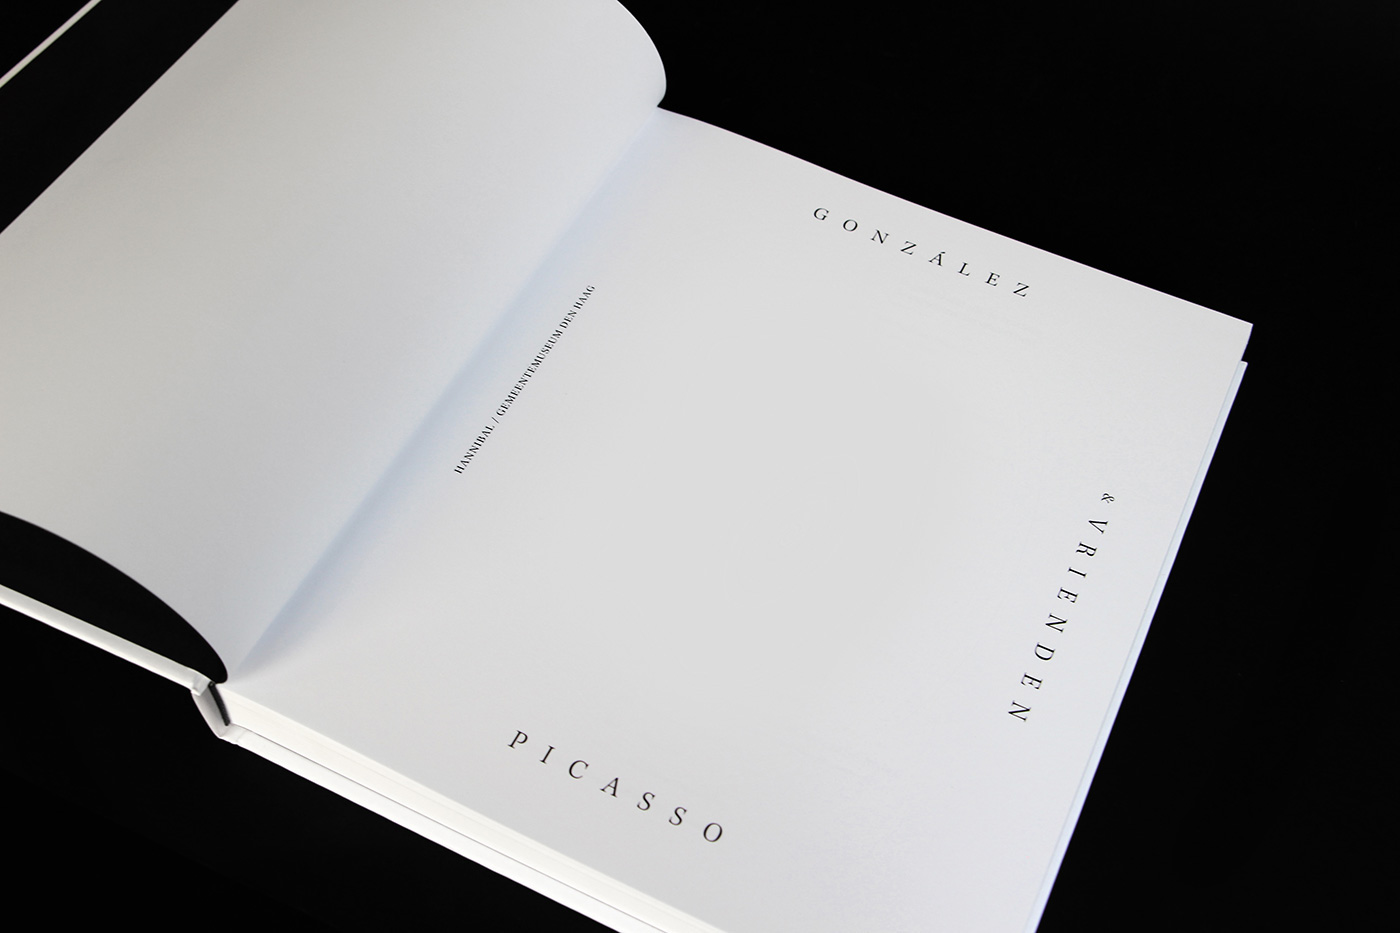 gonzales Picasso Bookdesign Brancusi coverdesign Gemeentemuseum DenHaag timbisschop artbook catalog